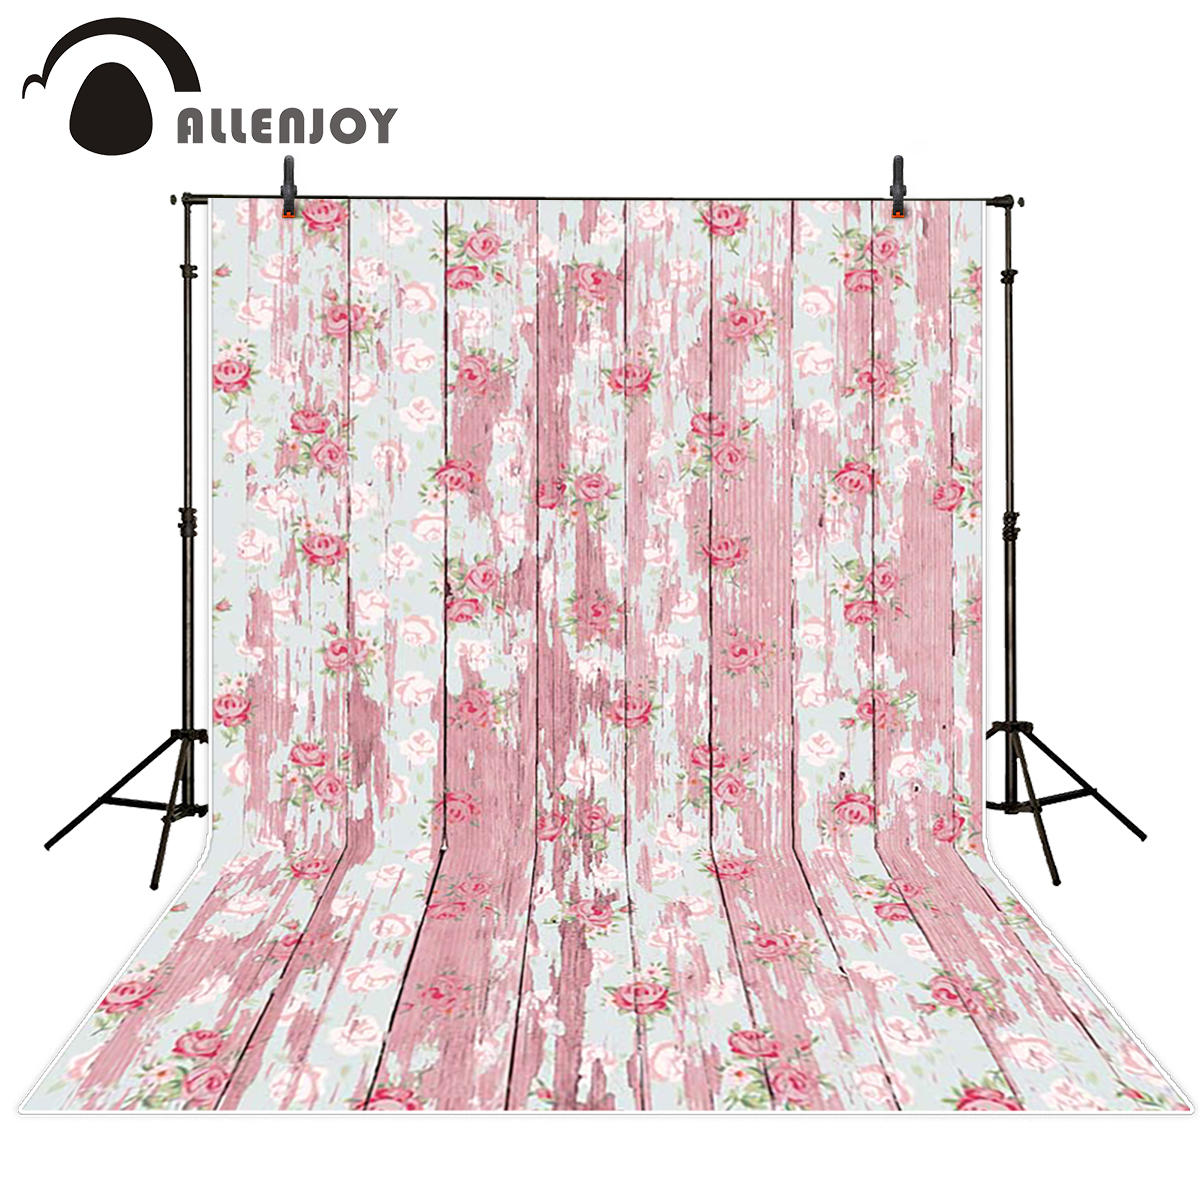 Allenjoy wood backdrop Roses pink wood vintage Background for photo Studio photo backgrounds fond studio photo background vinyl